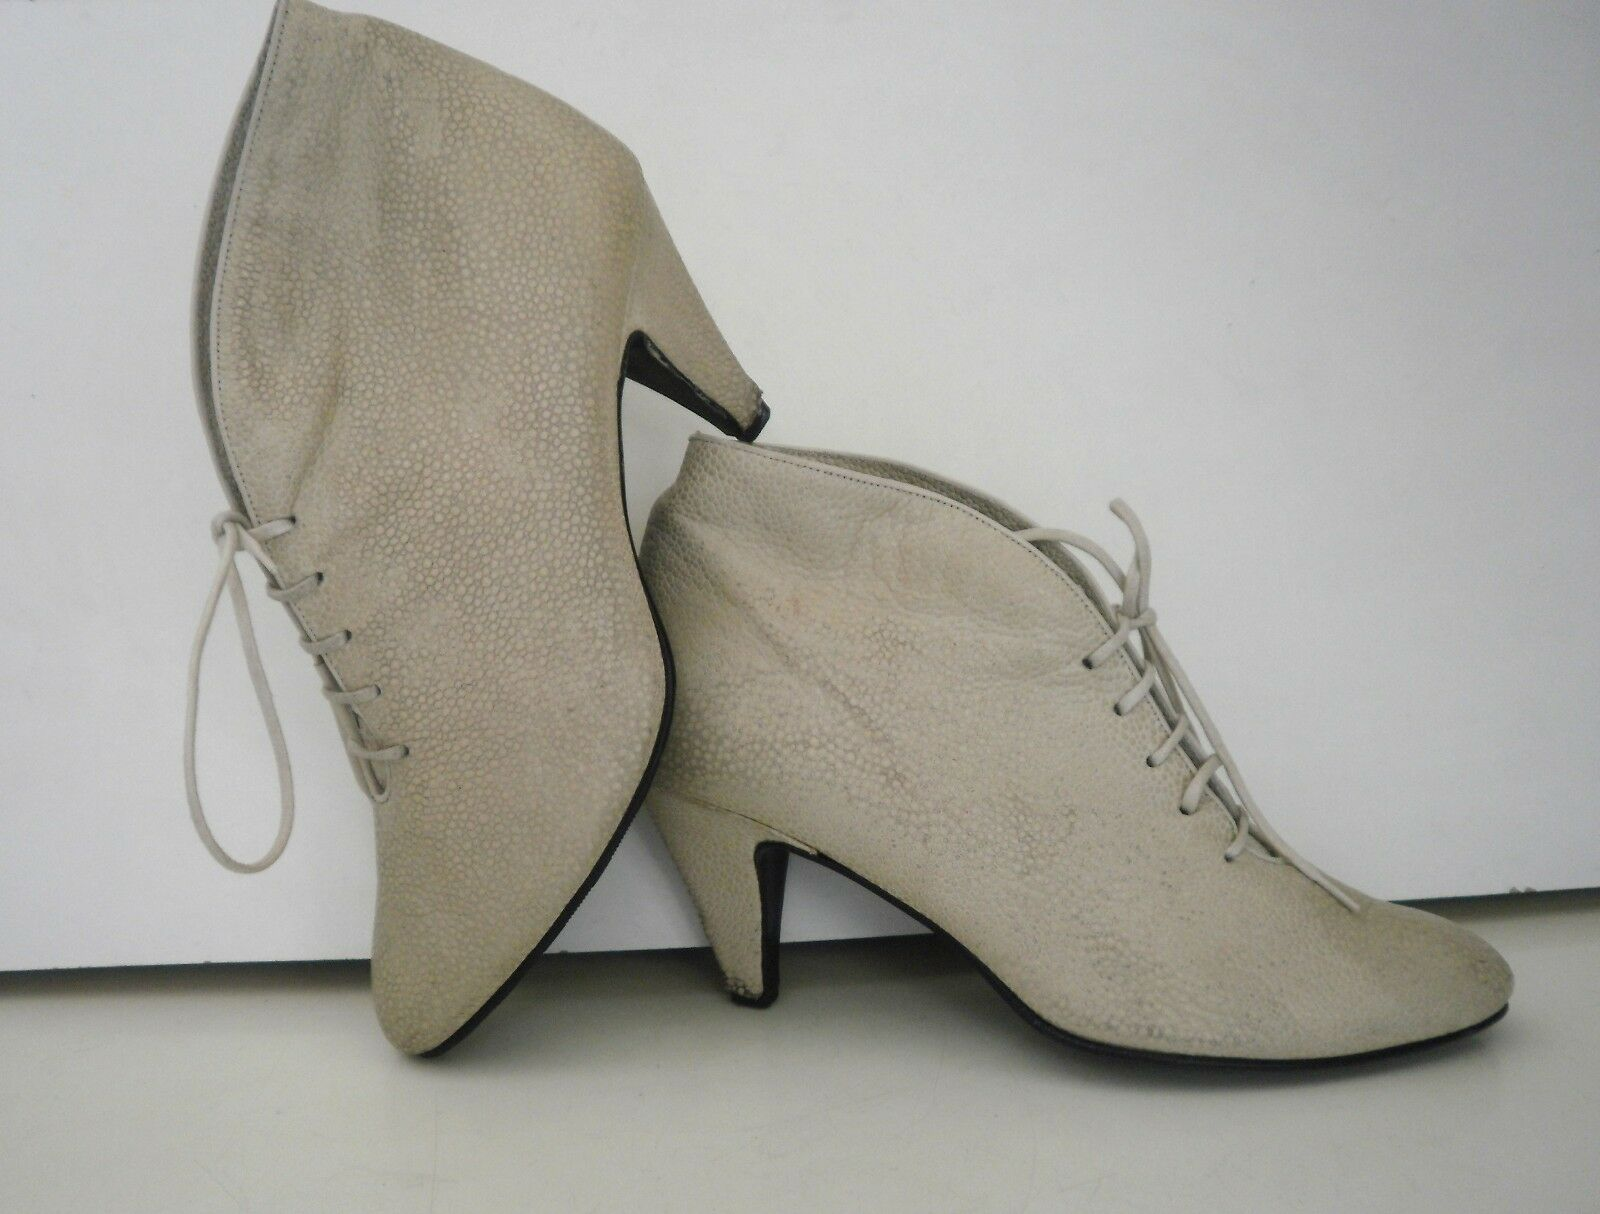 SchürStiefelette Damen Boots TRUE VINTAGE Schuhe ankle boot beige Stiefelette